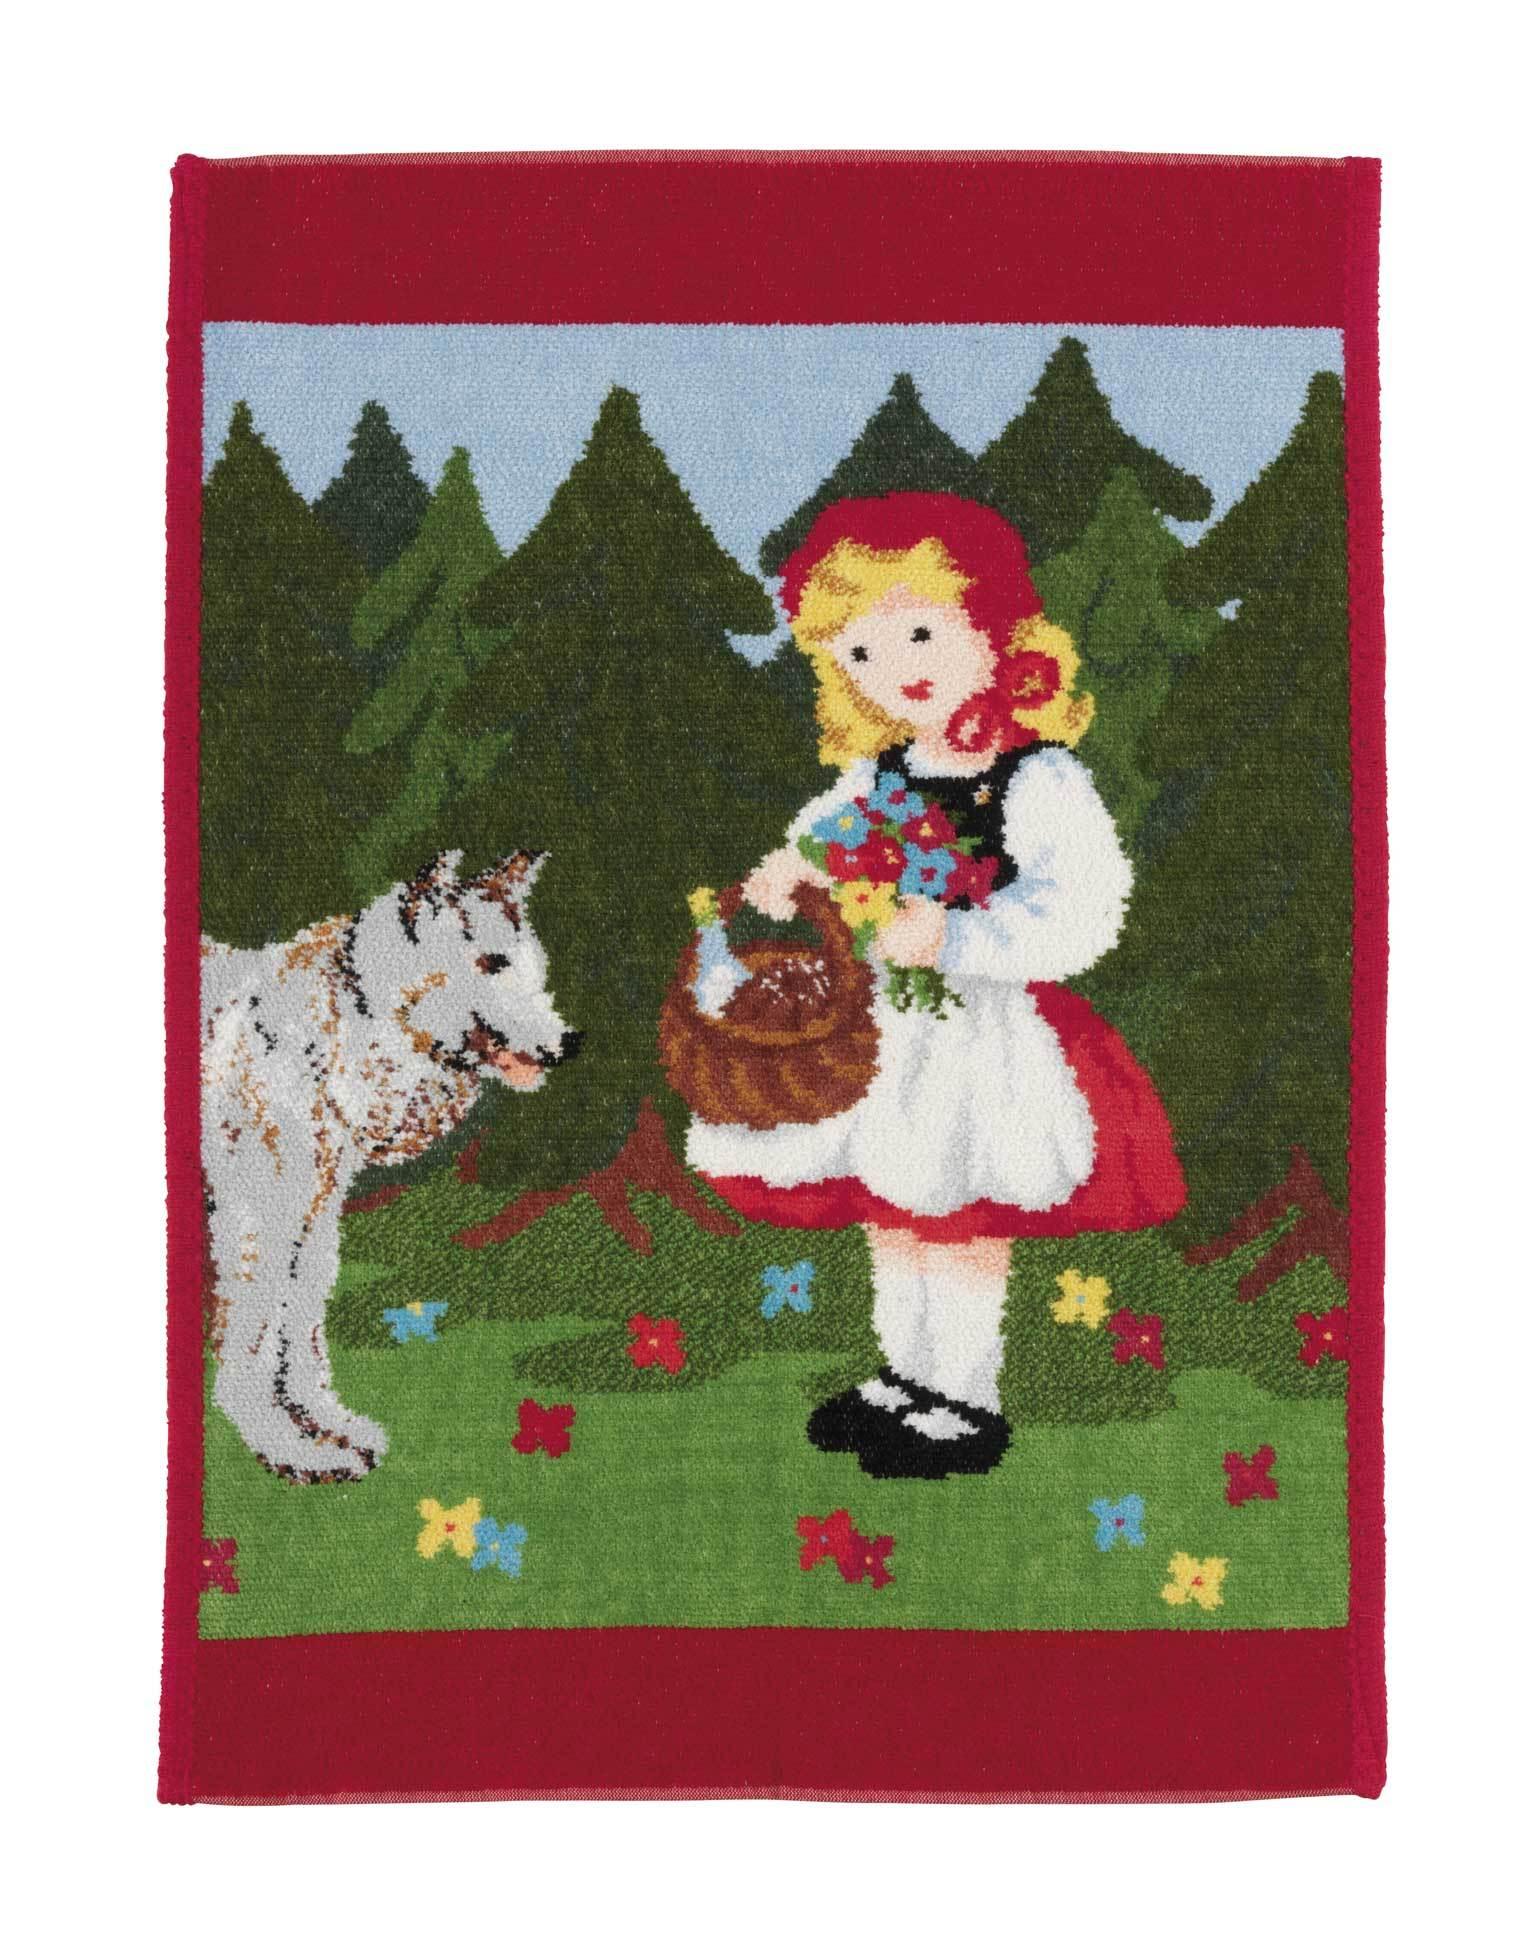 Полотенце детское 37x50 Feiler Marchen Little Red Riding Hood 120 красное